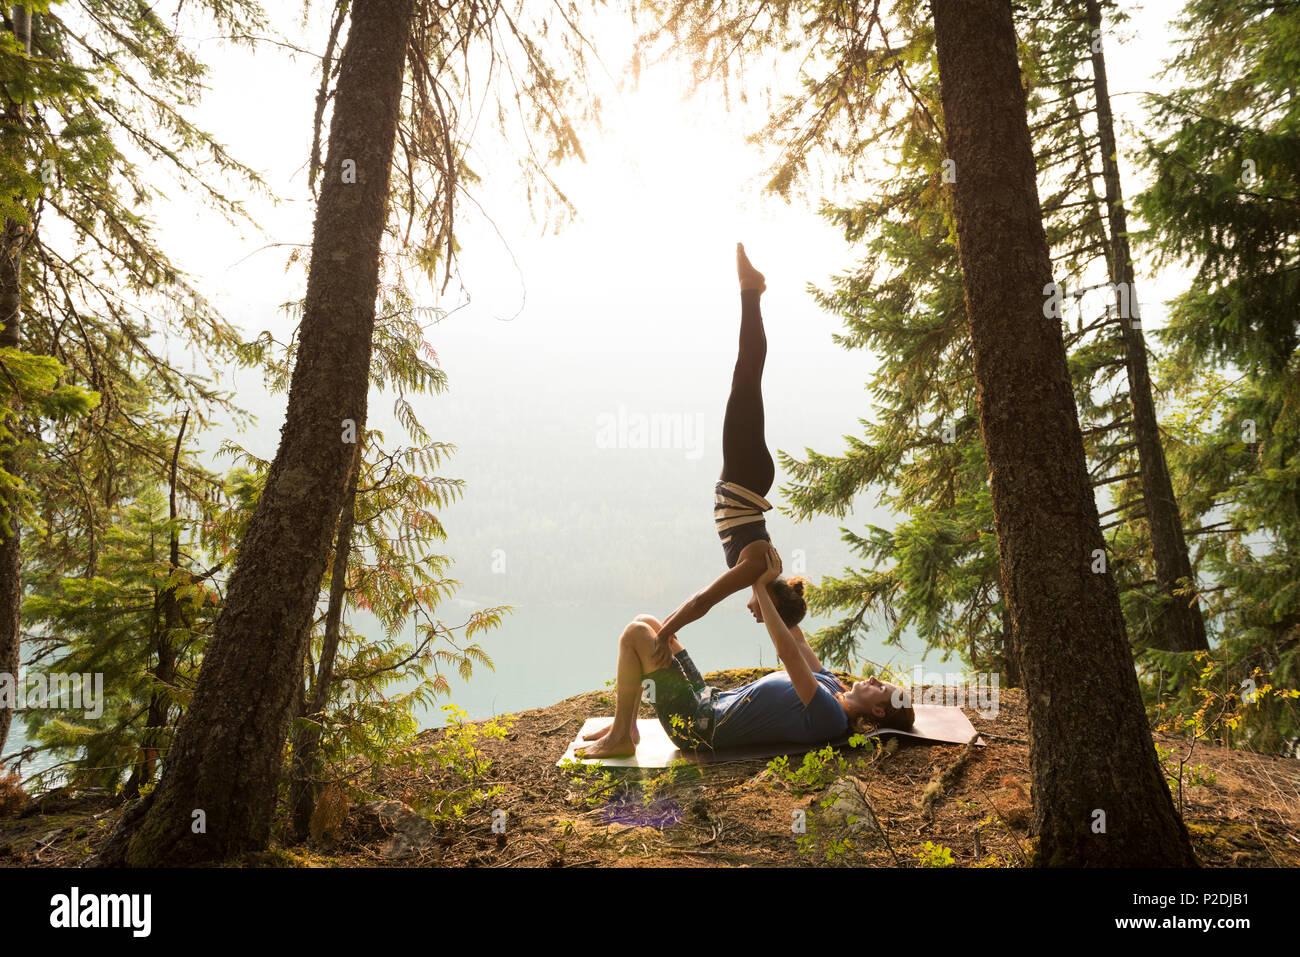 Sporty couple practicing yoga acro dans une luxuriante forêt verte Photo Stock